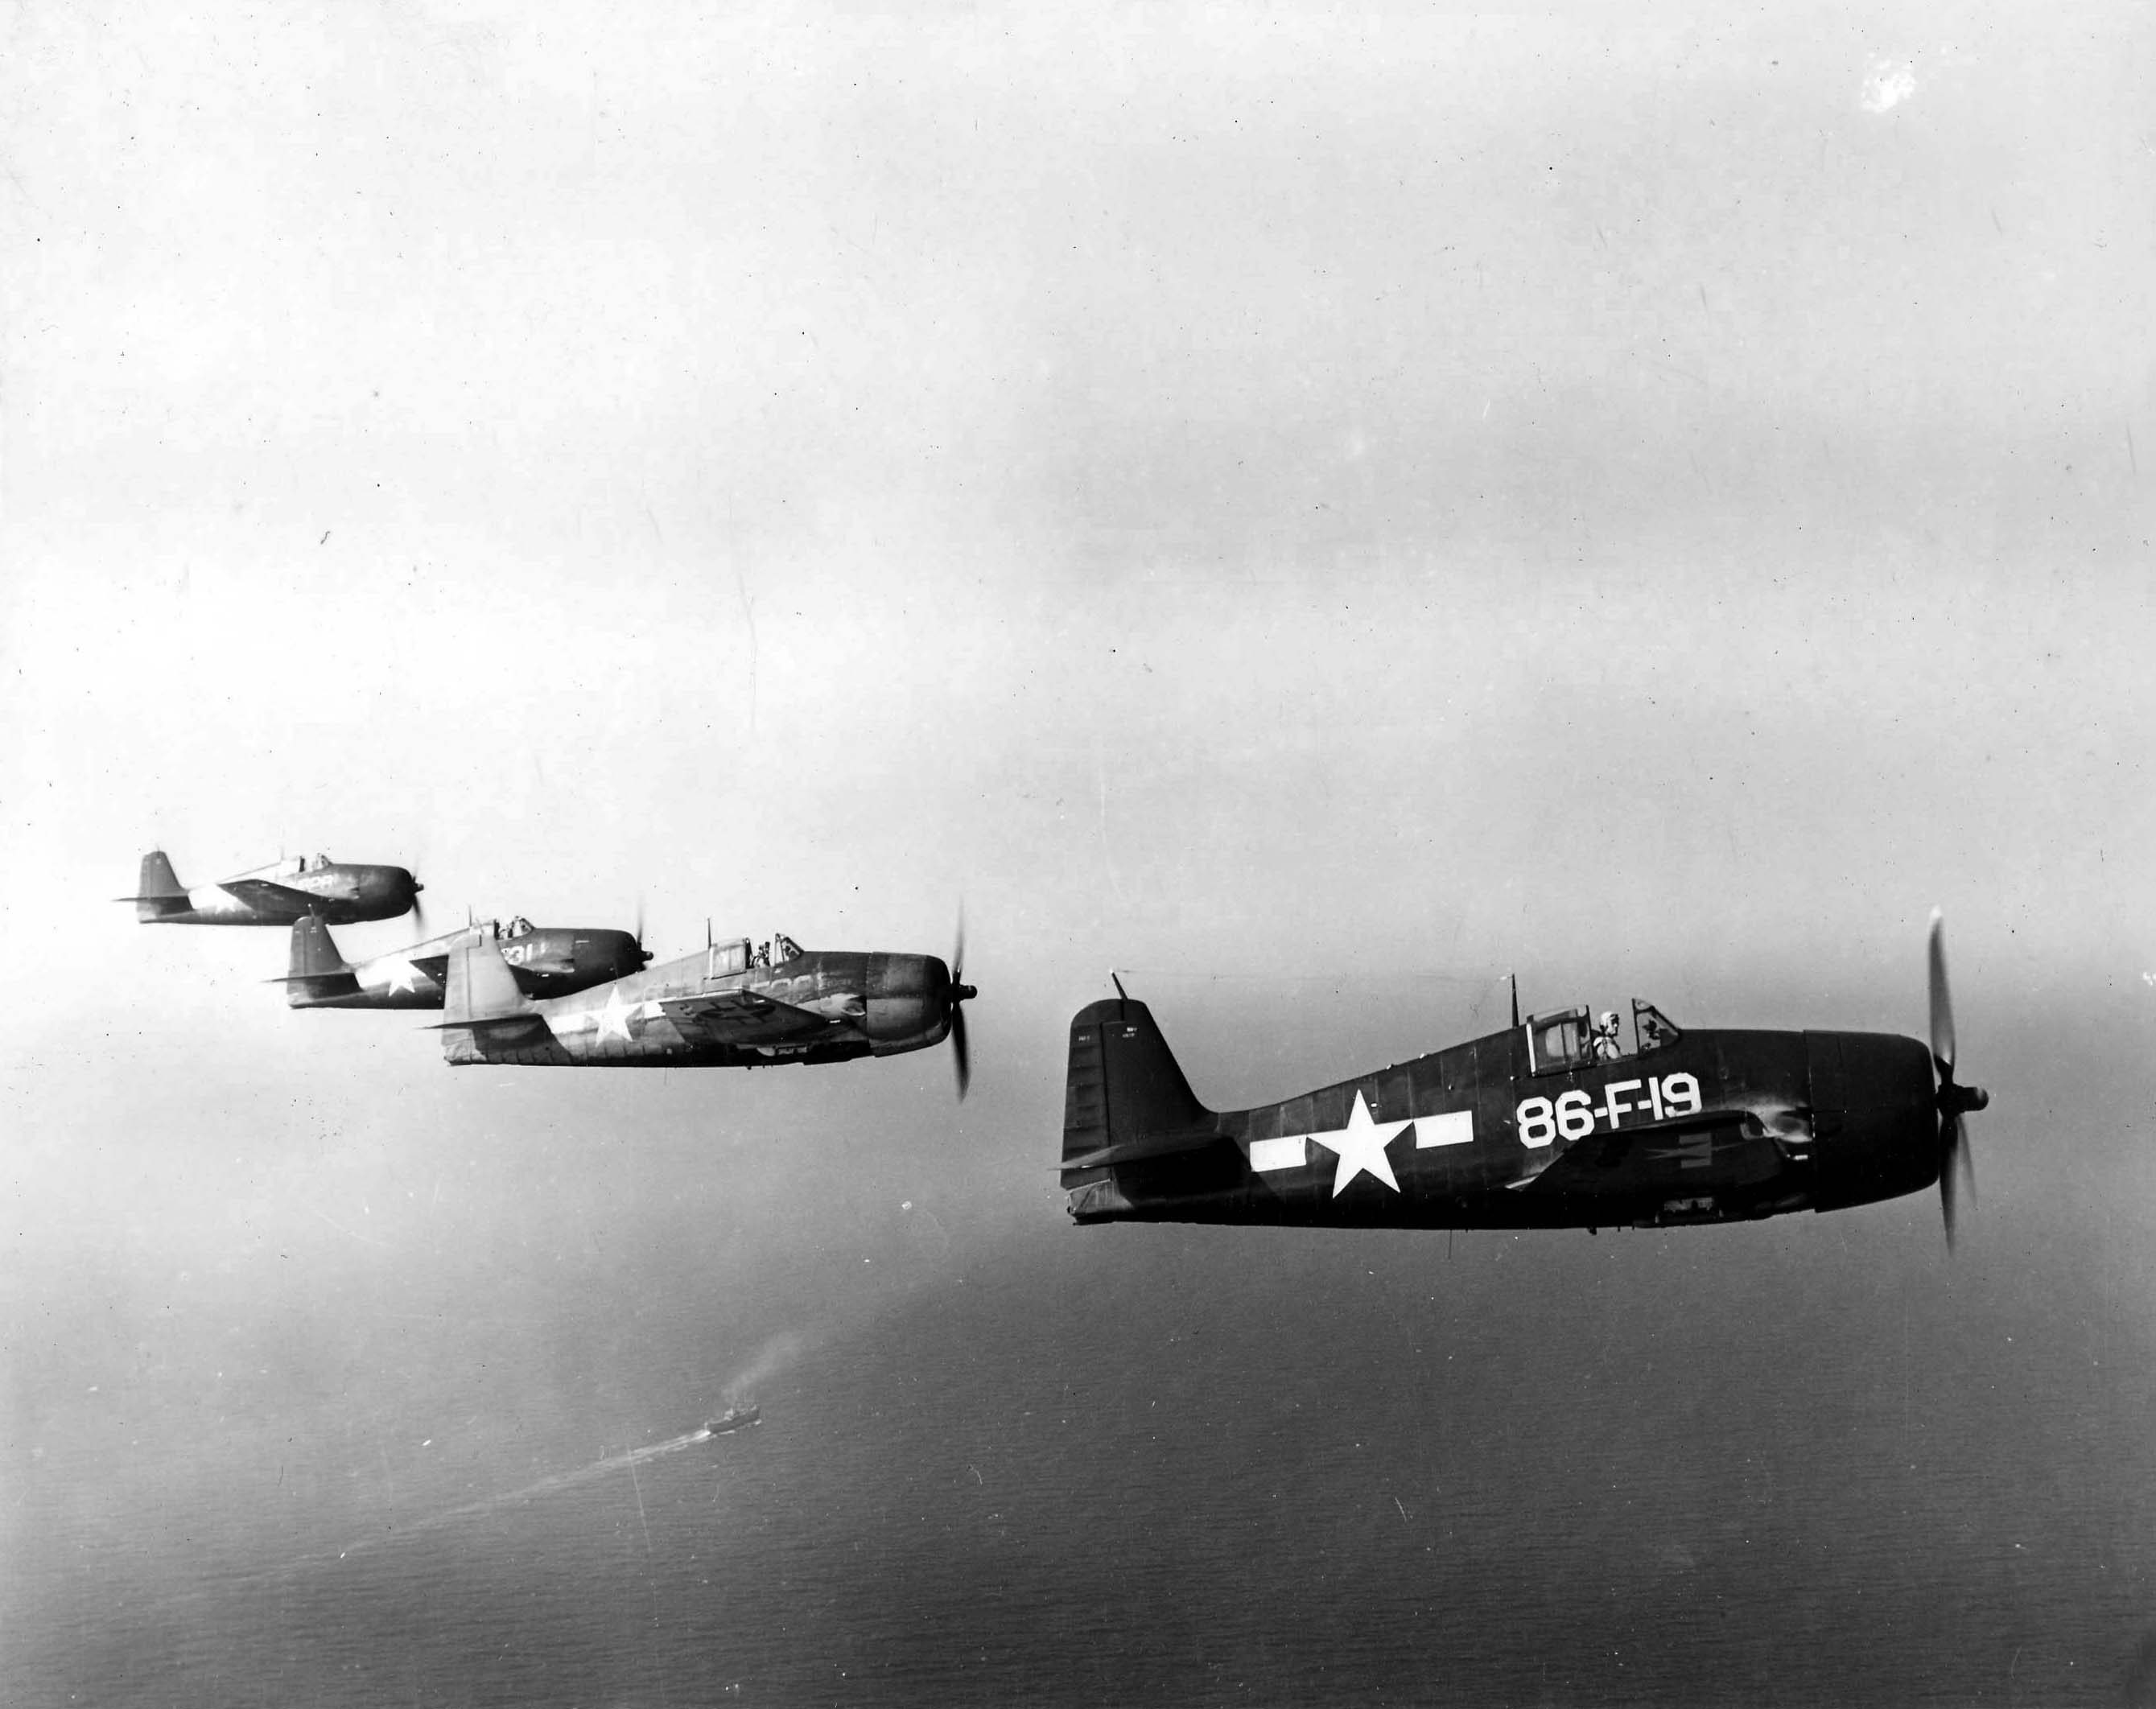 Grumman F6F 5 Hellcat VF 86 White 86F19 on patrol 01